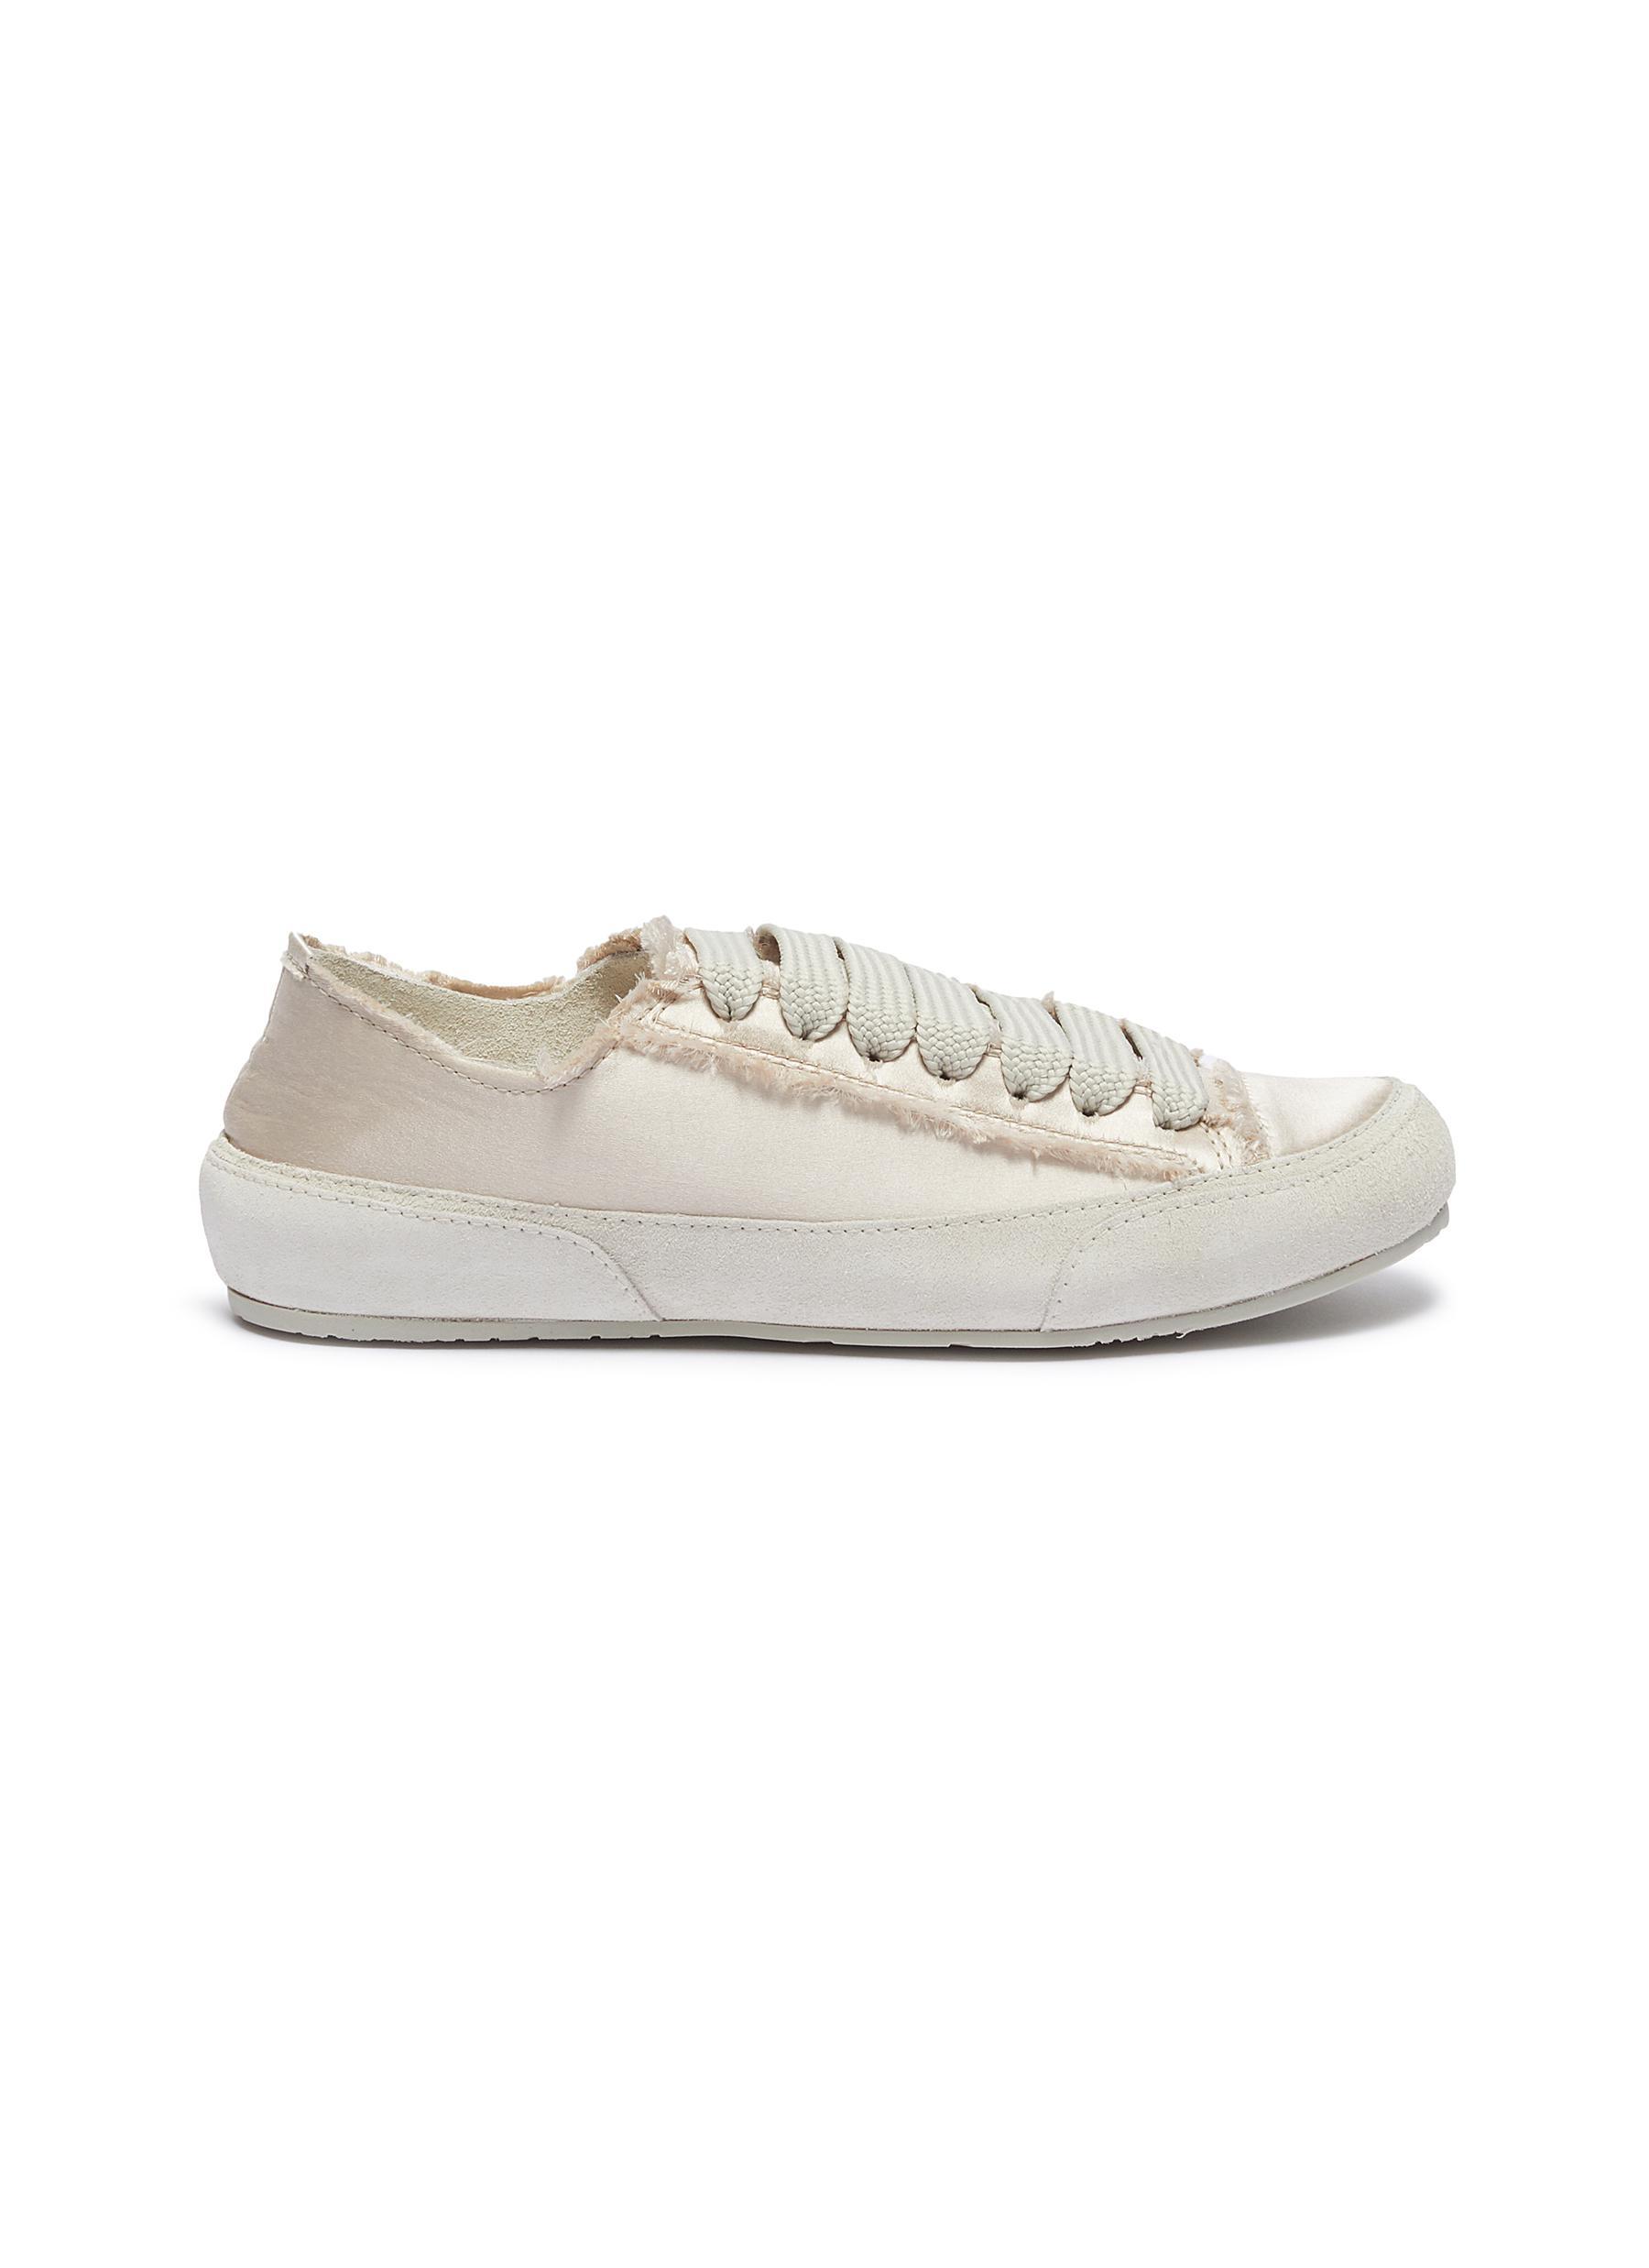 Pedro García Flats Parson satin sneakers